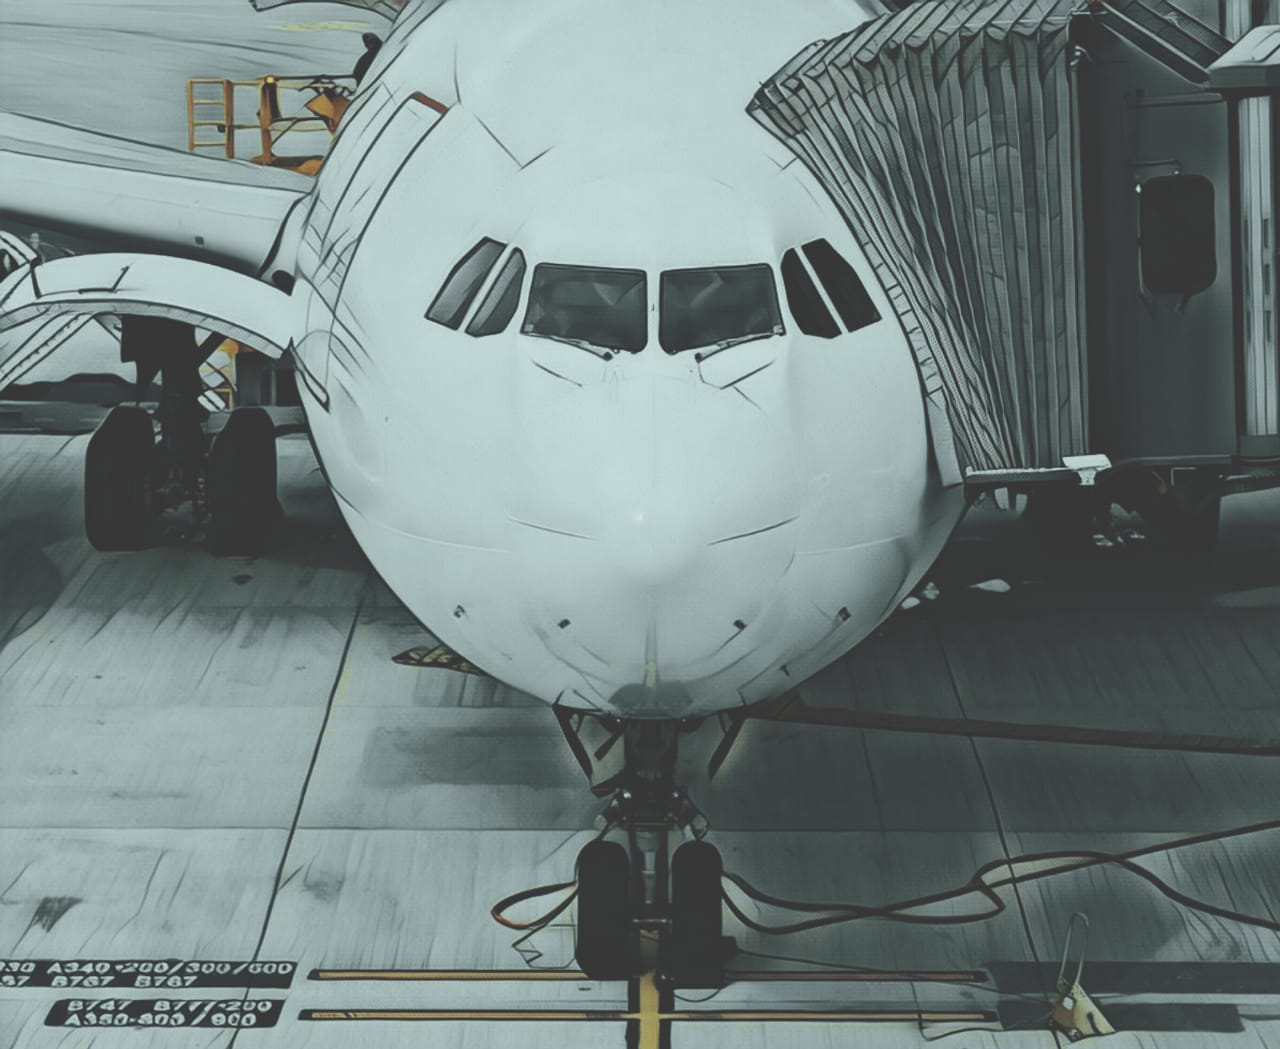 https: img-z.okeinfo.net content 2019 04 01 20 2037665 inflasi-maret-0-11-pemicunya-harga-tiket-pesawat-yang-mahal-C47lm1JE3T.jpeg